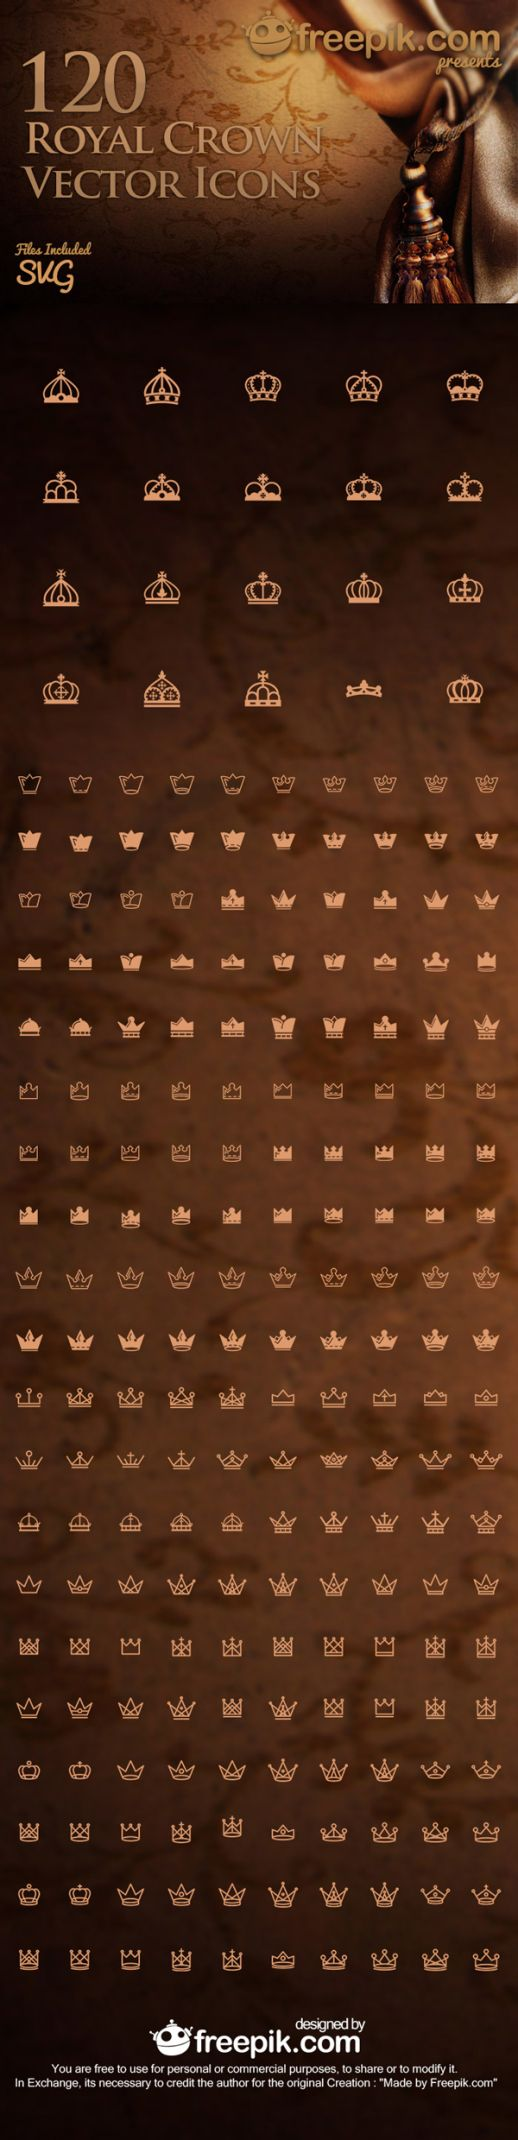 Royal Crown Free Vector Icon Set